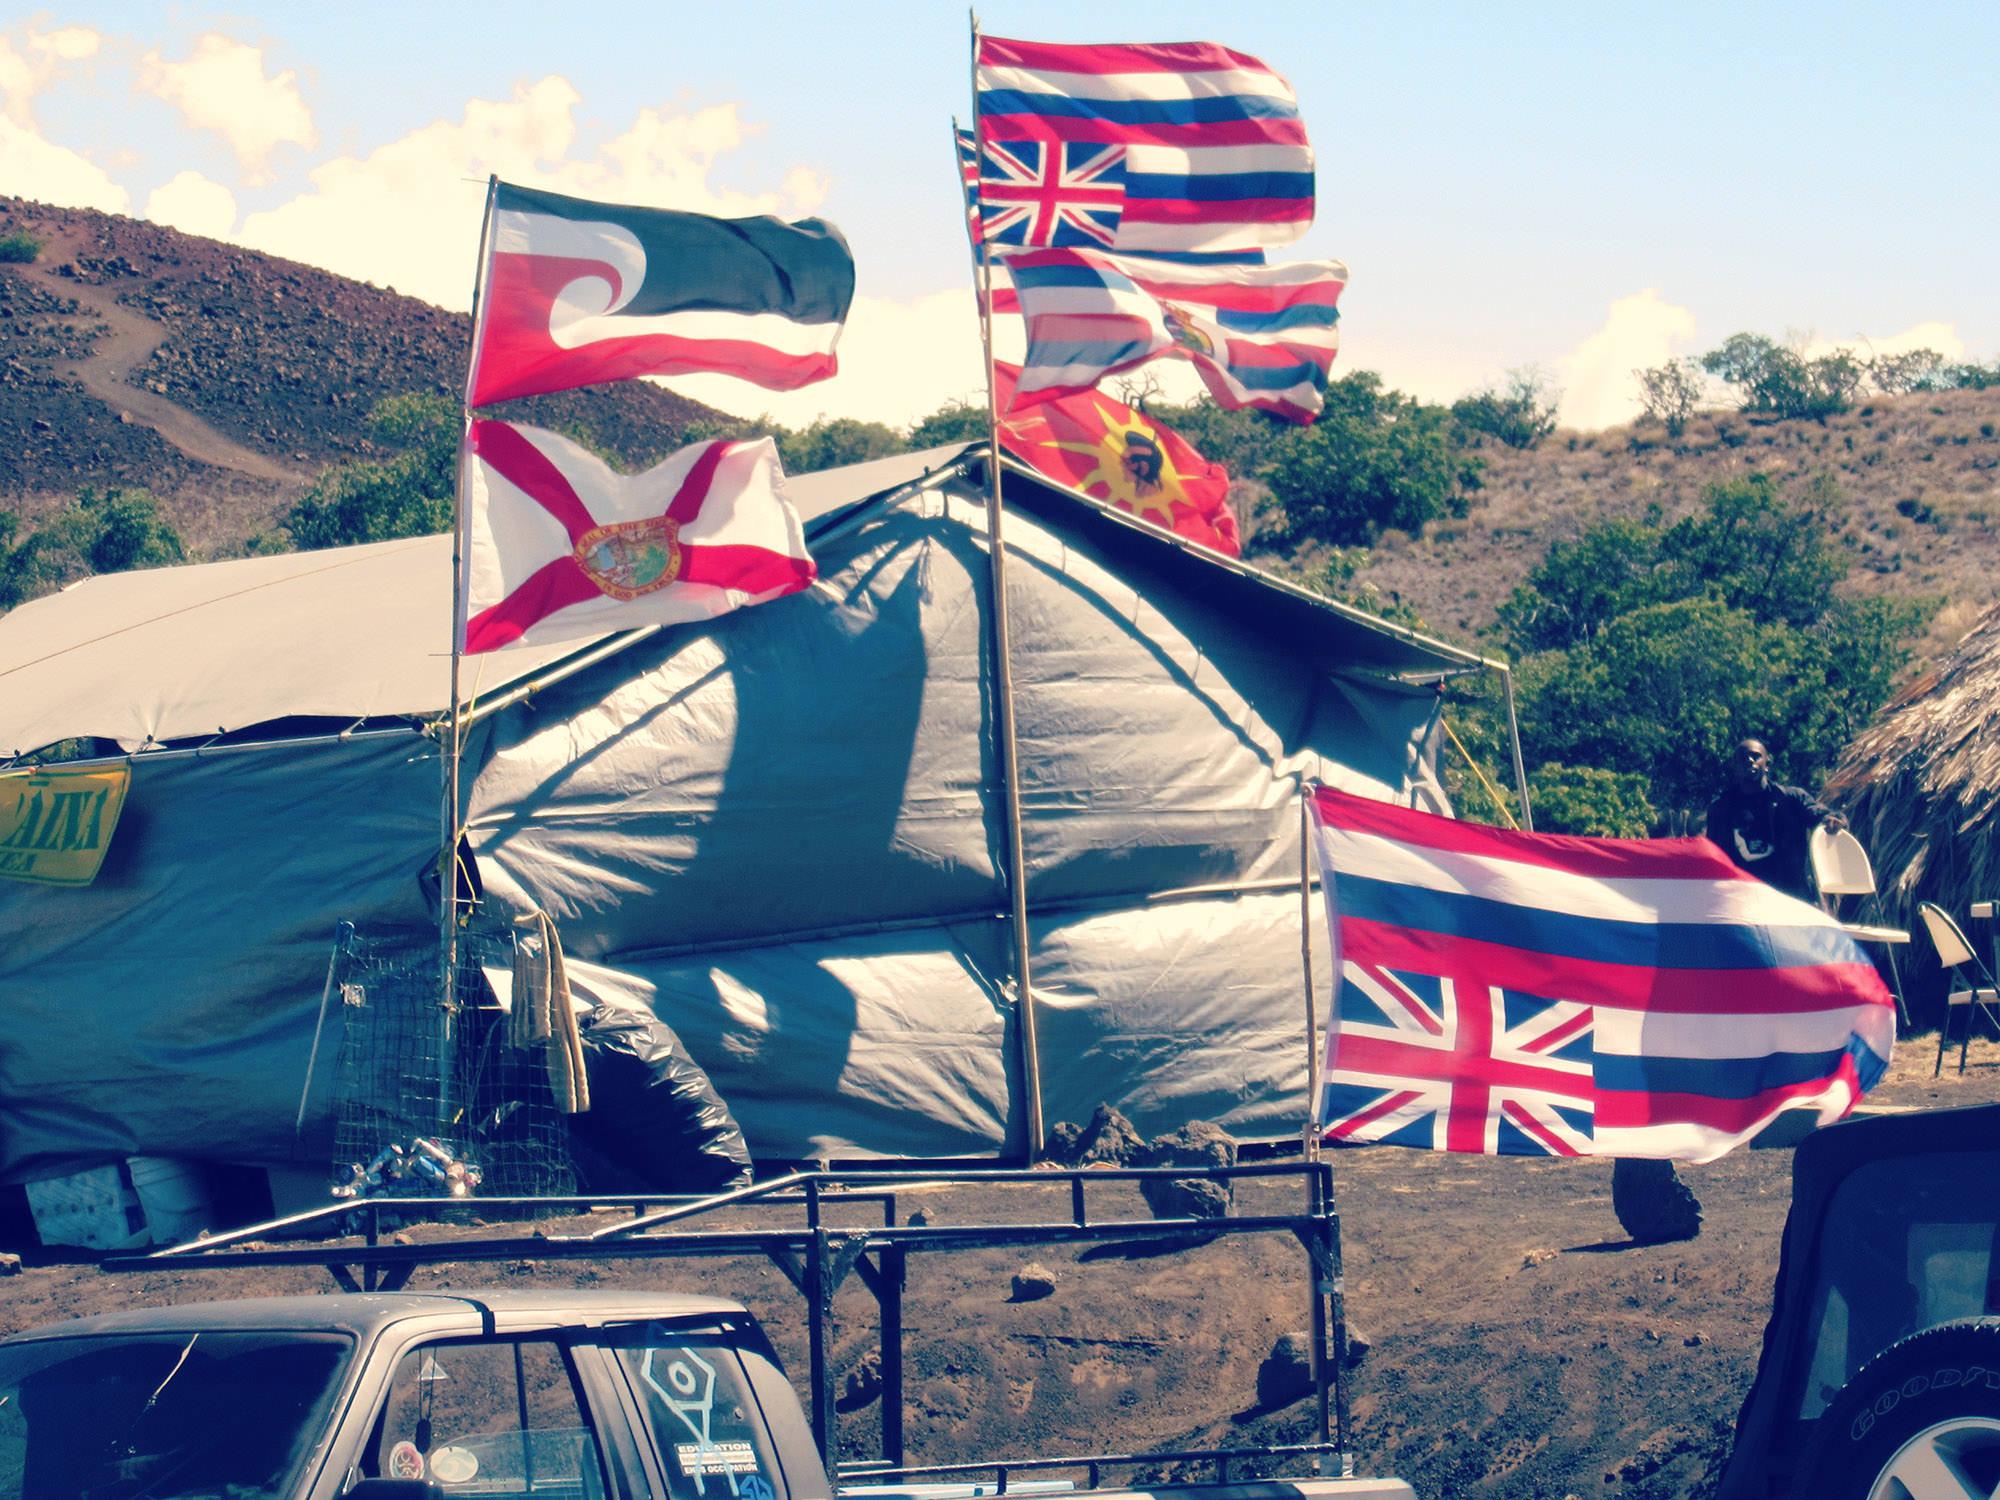 Fig. 24 Protectors camp on Mauna Kea (Mauna a Wākea), Hawai'i Island, flags hung upside-down as signal of distress, June 2015. Photo: ©Greg Johnson